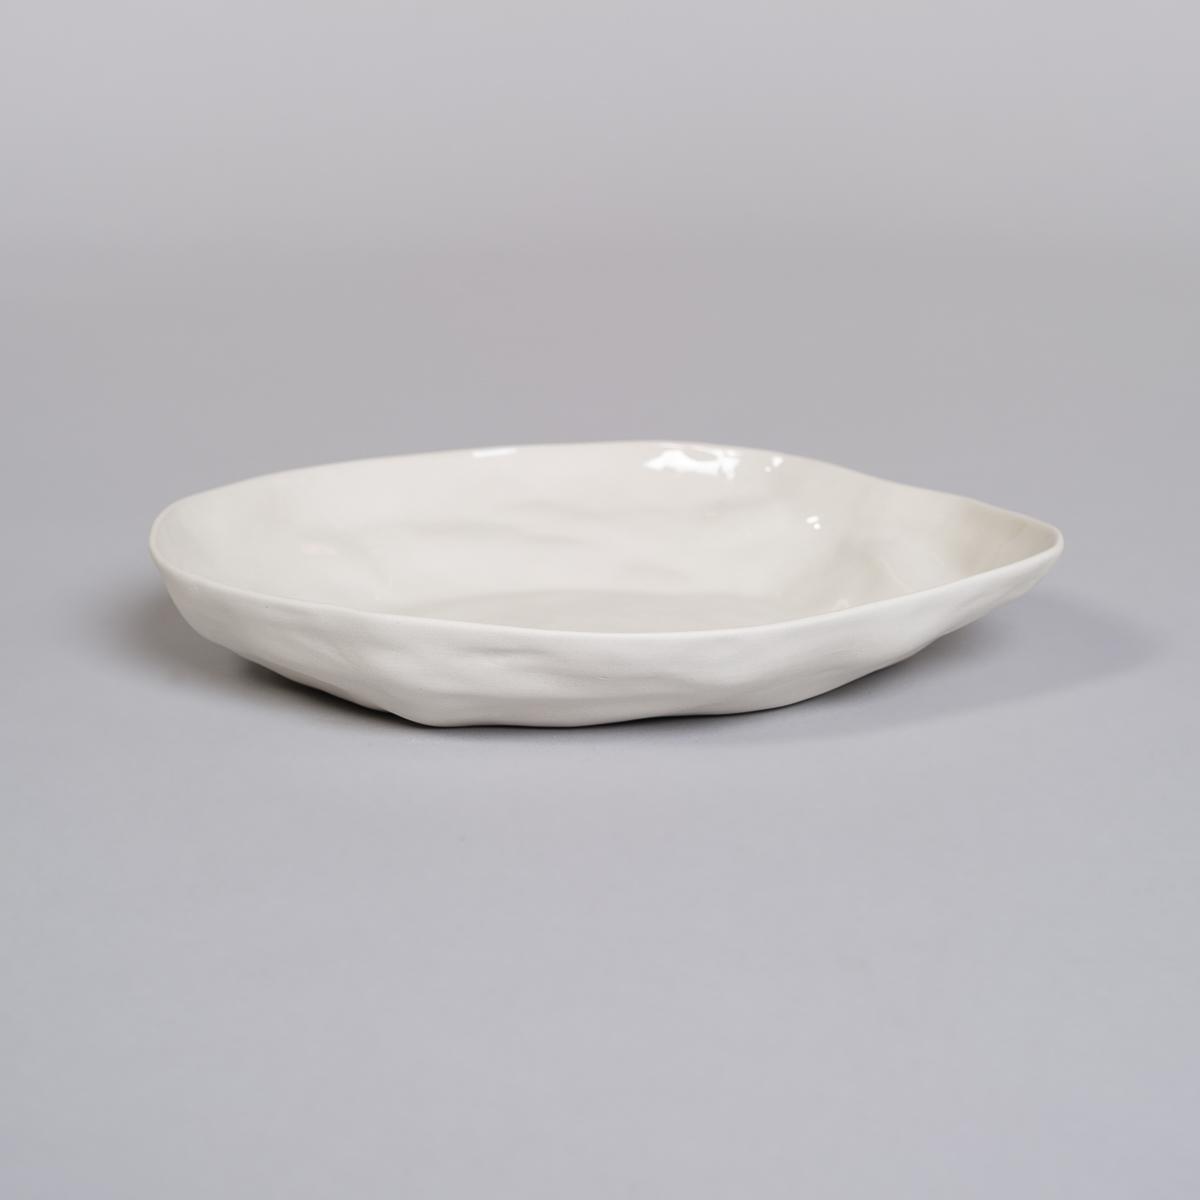 Fat i Porselen - Krem-0